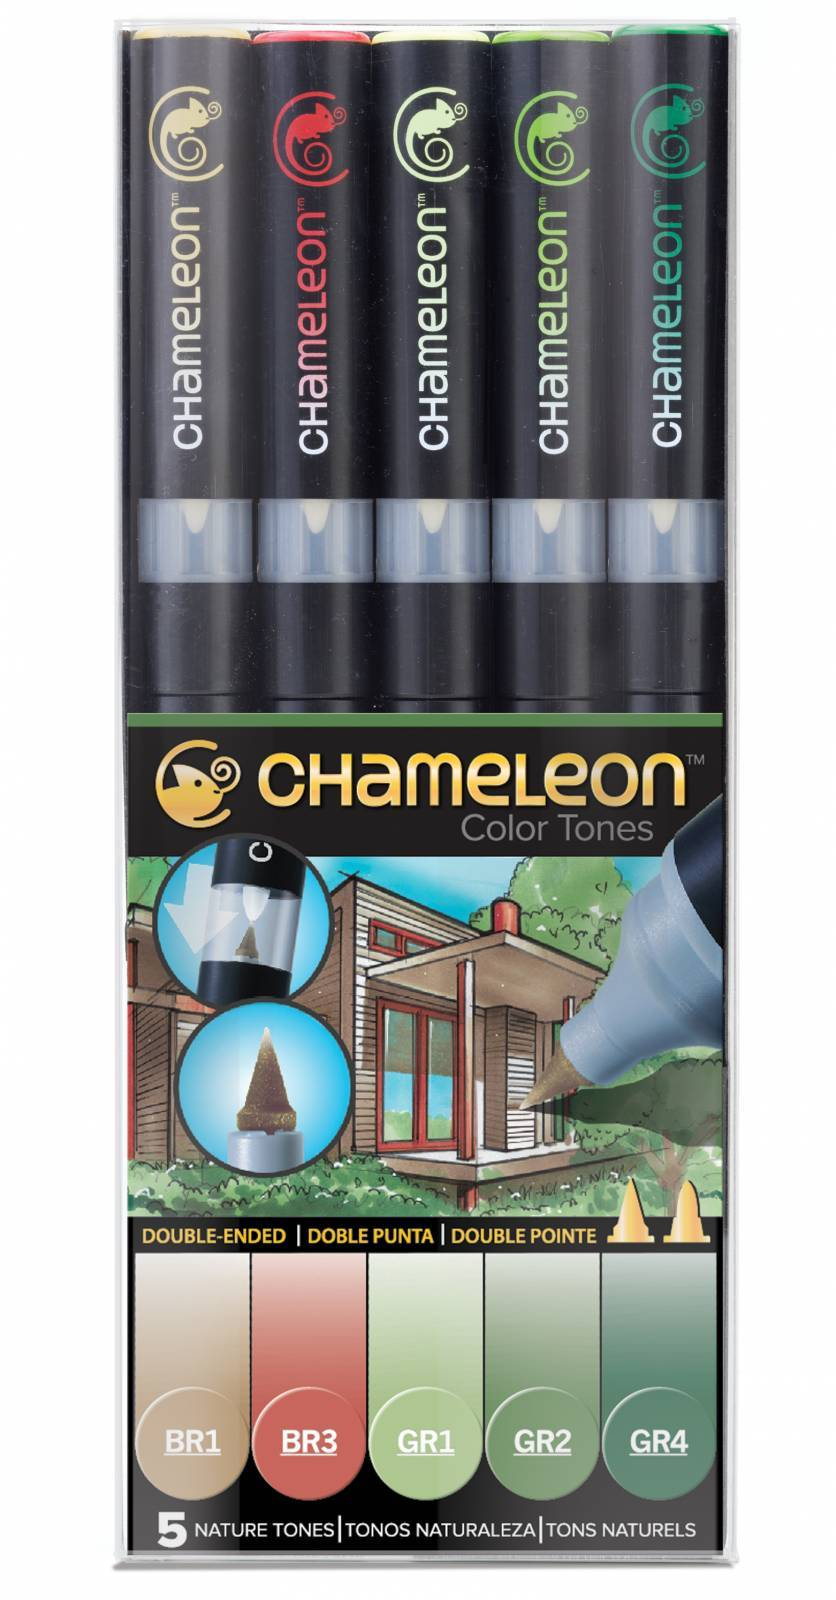 KIT CHAMELEON 5 CANETAS TONS DE NATUREZ CT0514